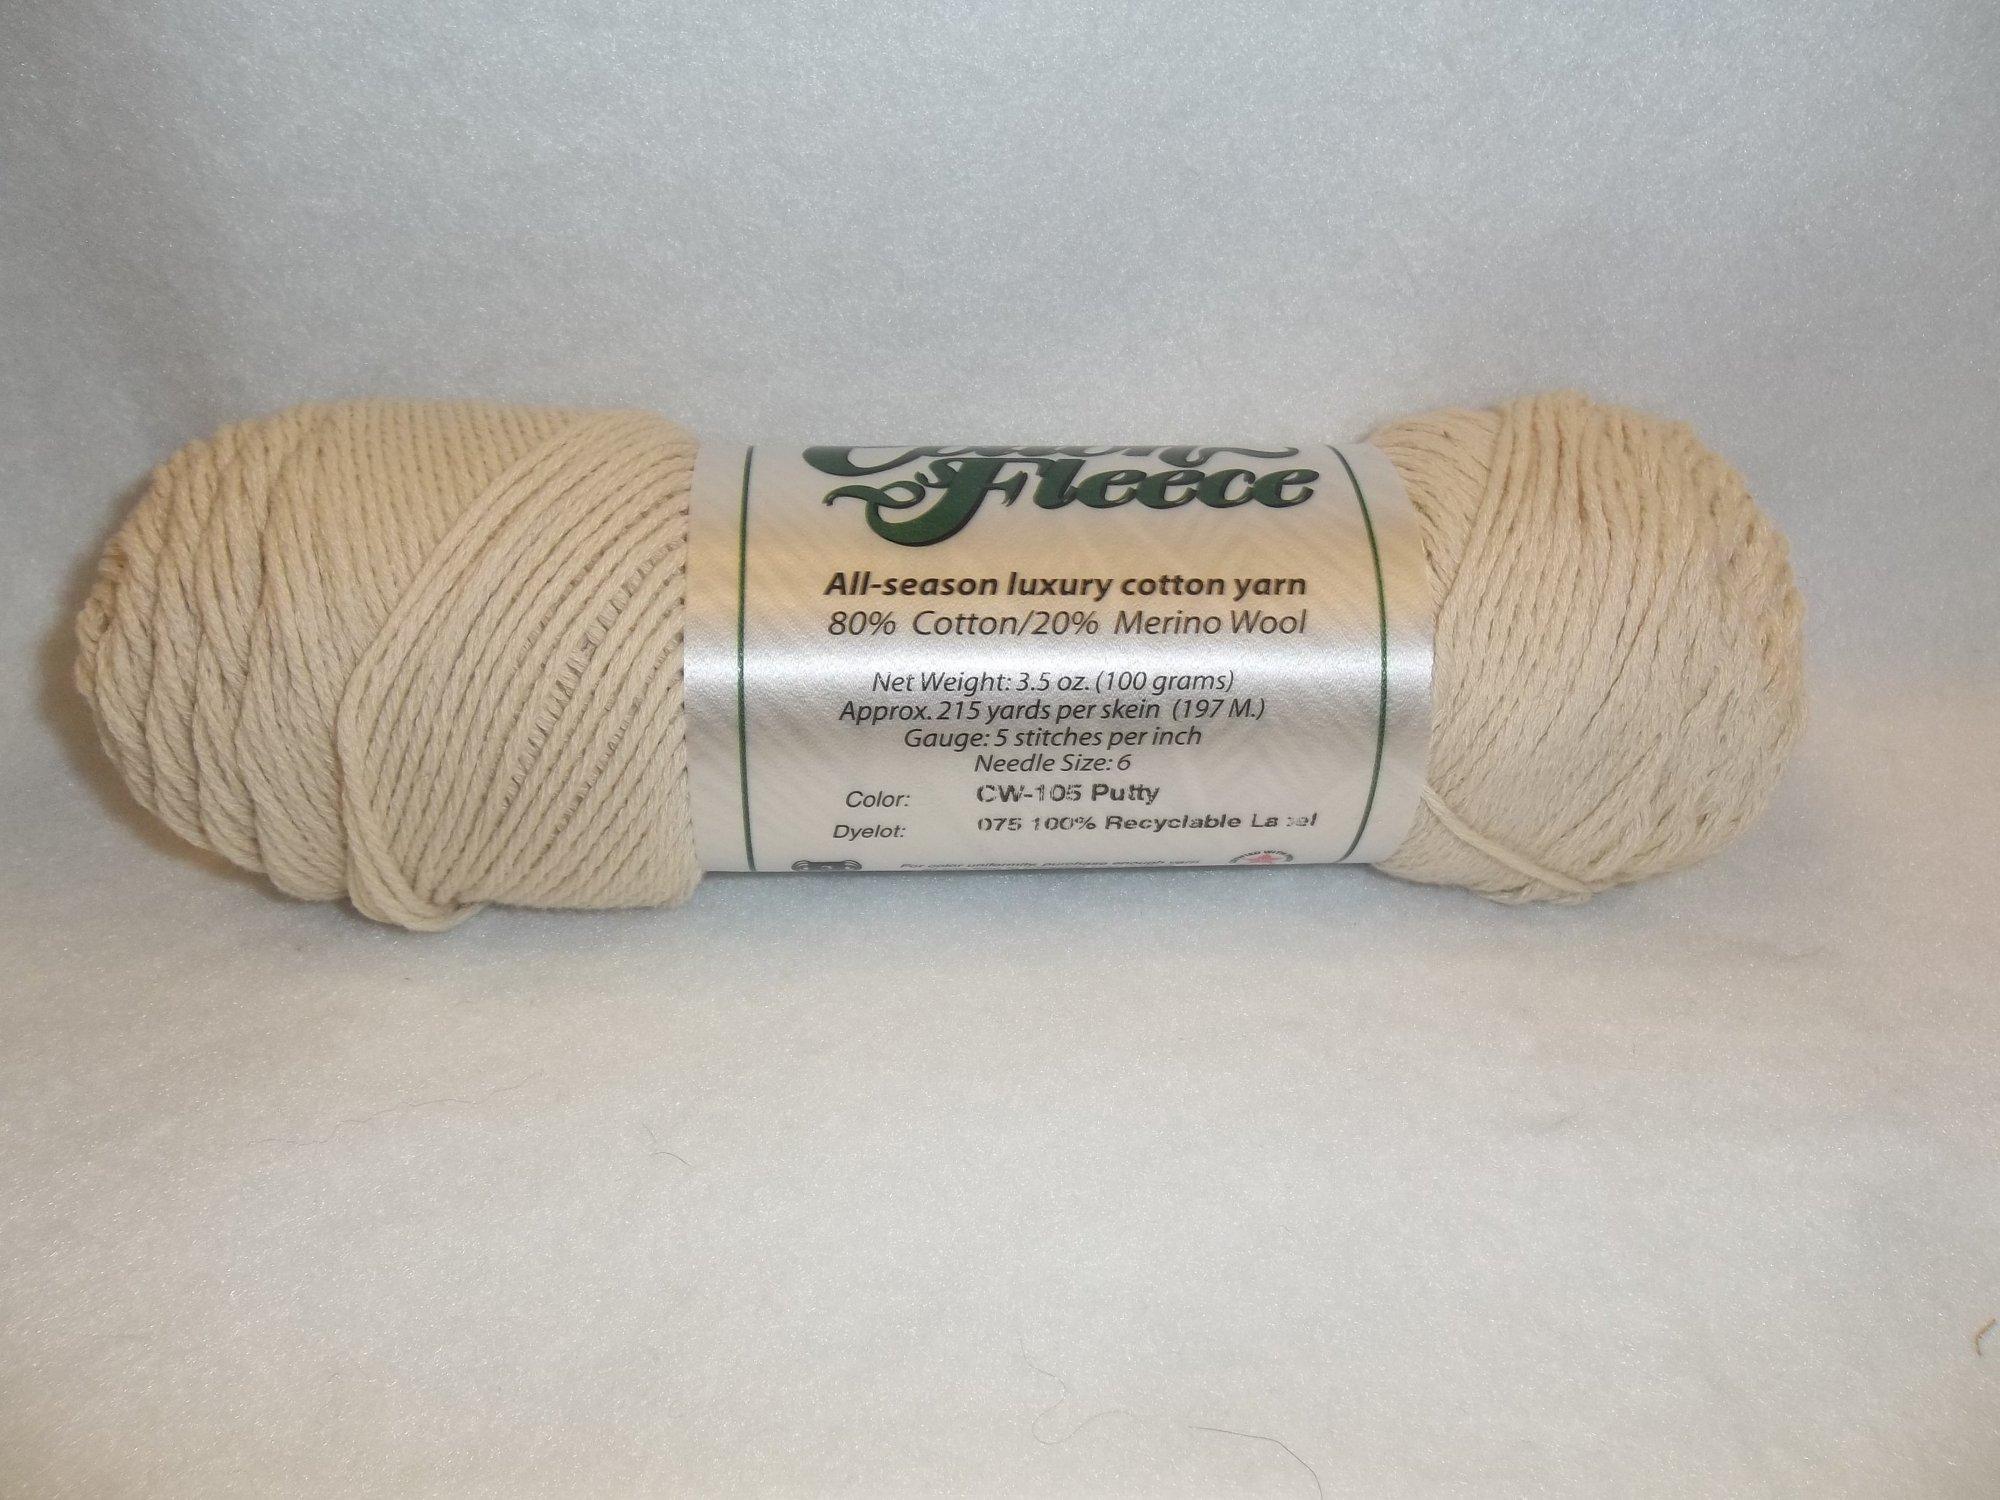 Cotton Fleece - CW-105 Putty (Natural)